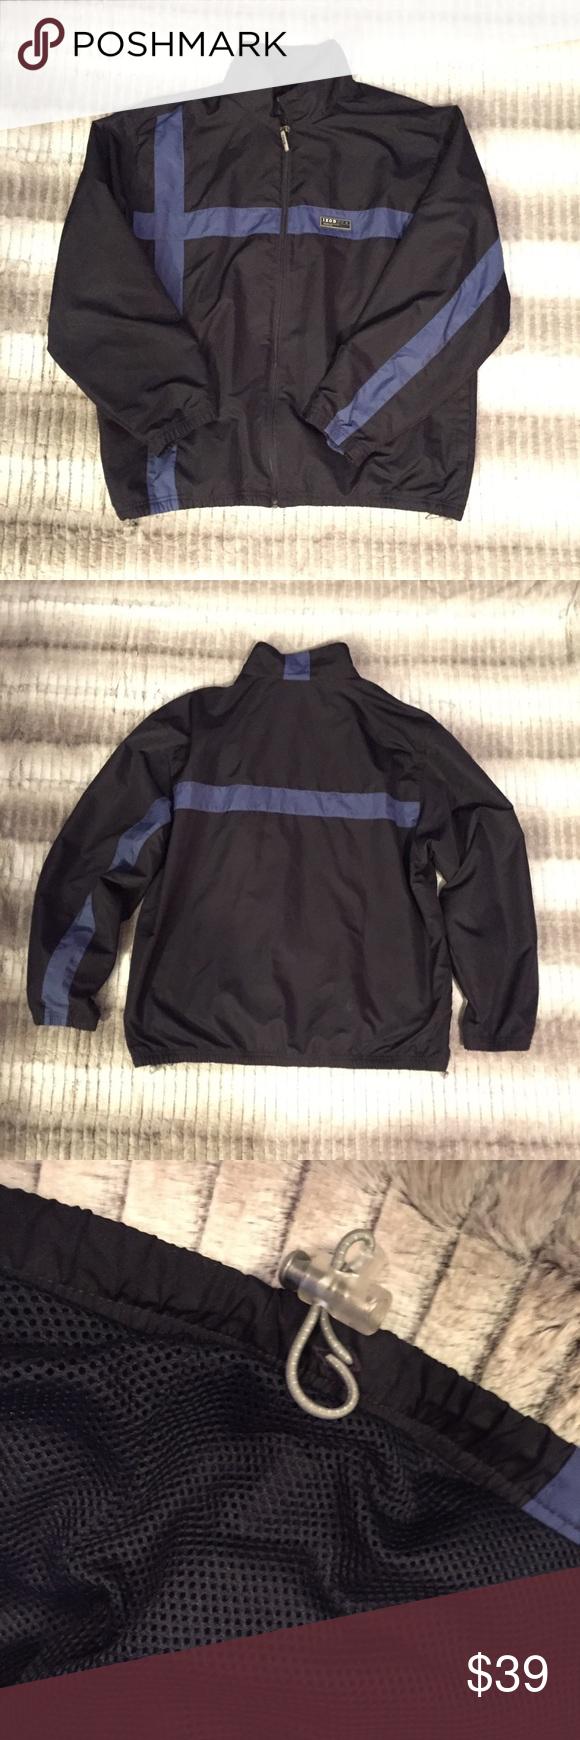 I Just Added This Listing On Poshmark Izod Pfx Sporty Thermo Zip Outerwear Blue Navy Xl Shopmycloset Poshmark Fashion Sh Clothes Design Outerwear Fashion [ 1740 x 580 Pixel ]